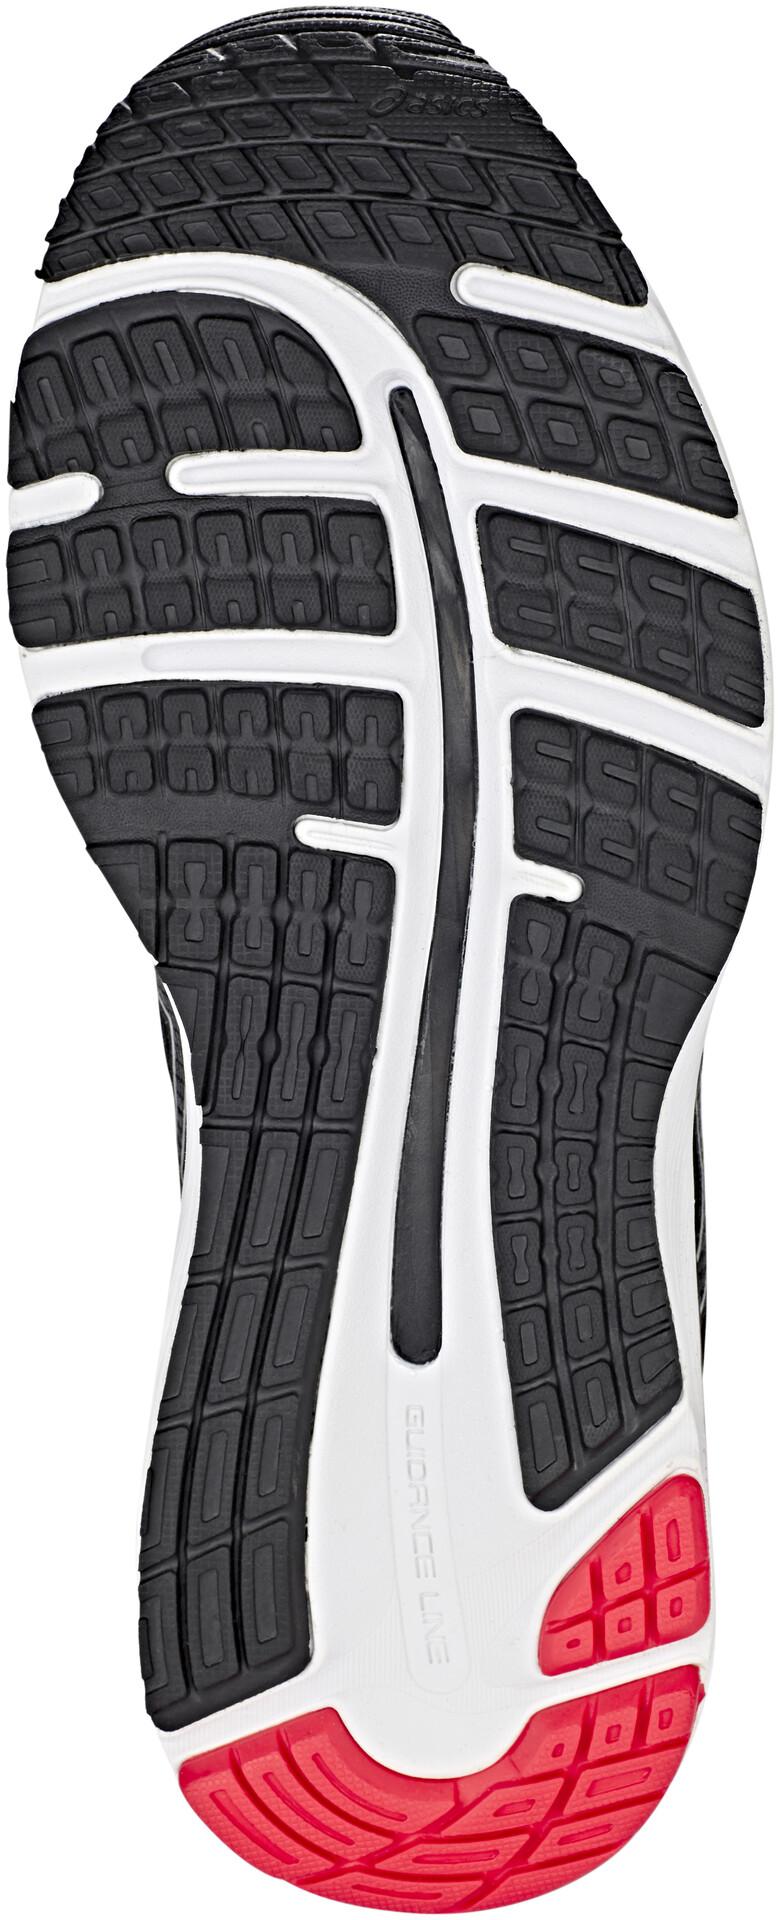 Sp Noir 20 Boutique Chaussures Cumulus Running Homme Gel Asics AHwq6tx